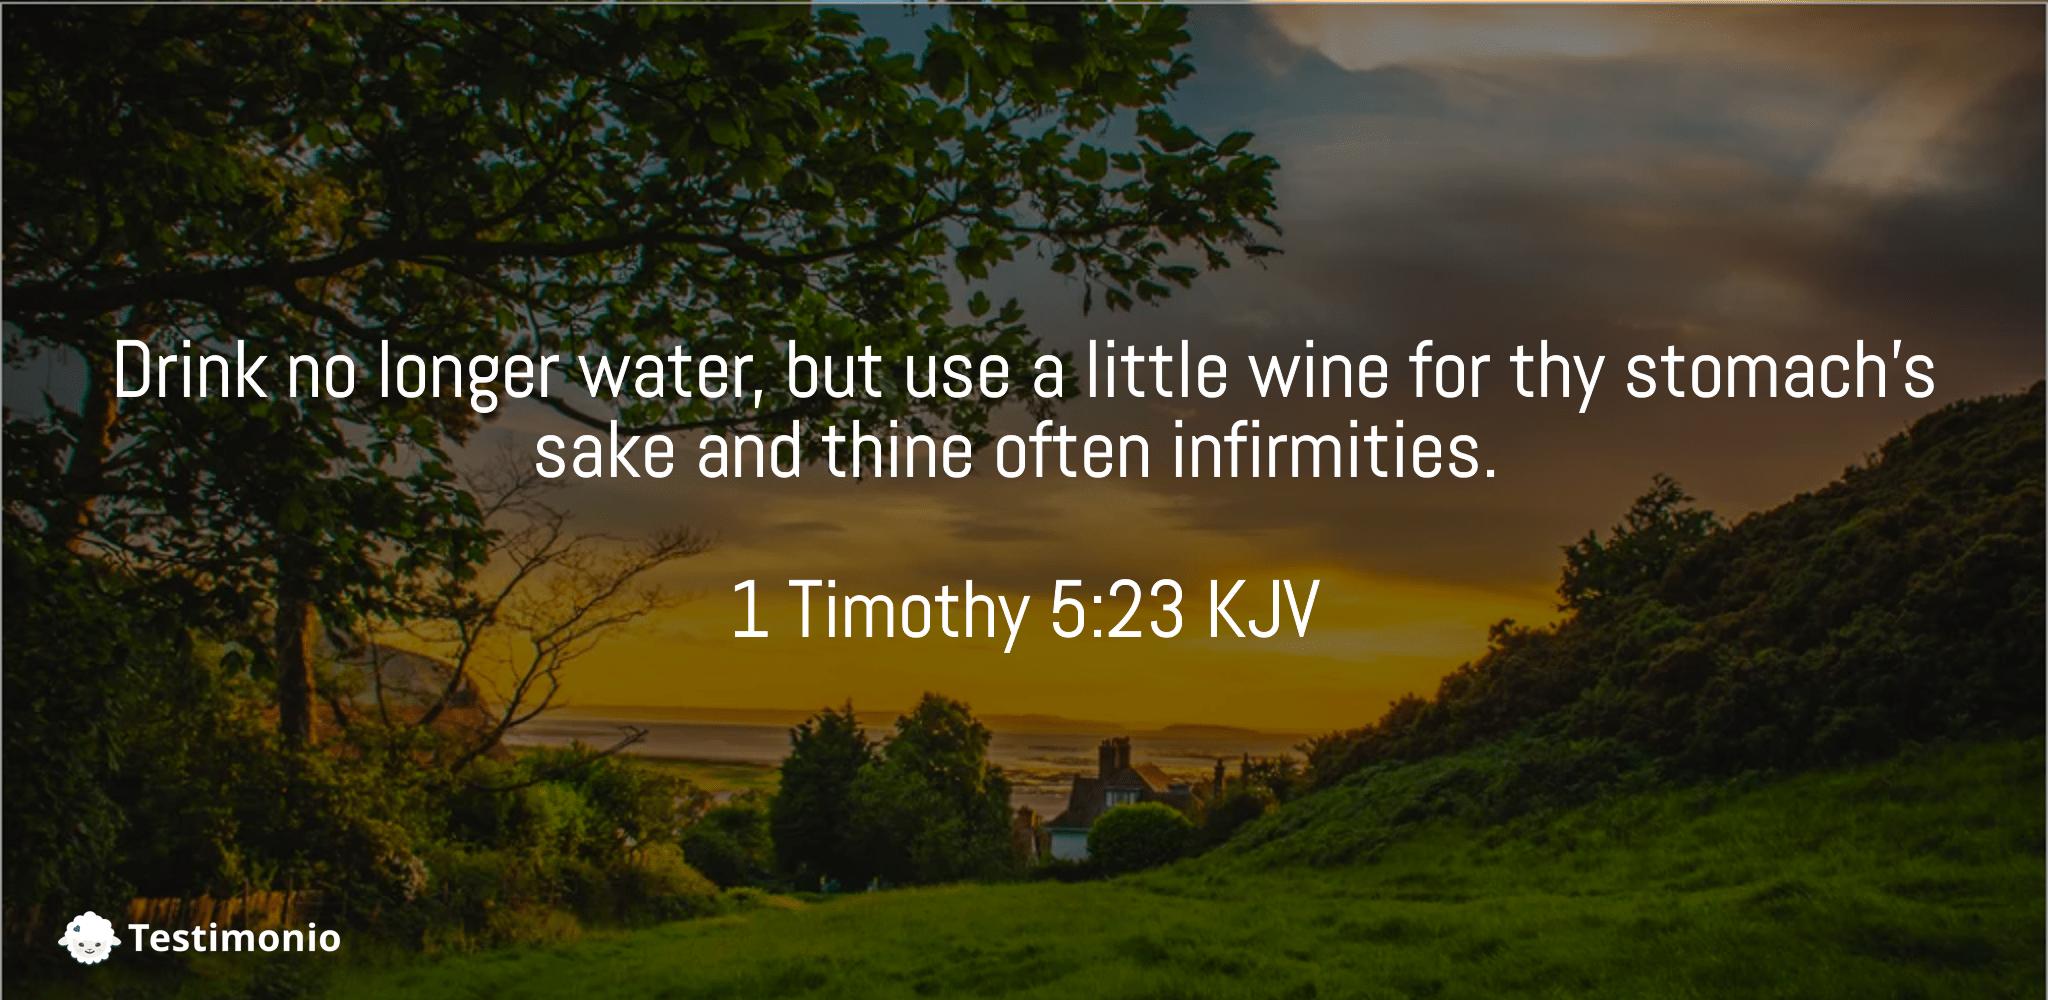 1 Timothy 5:23